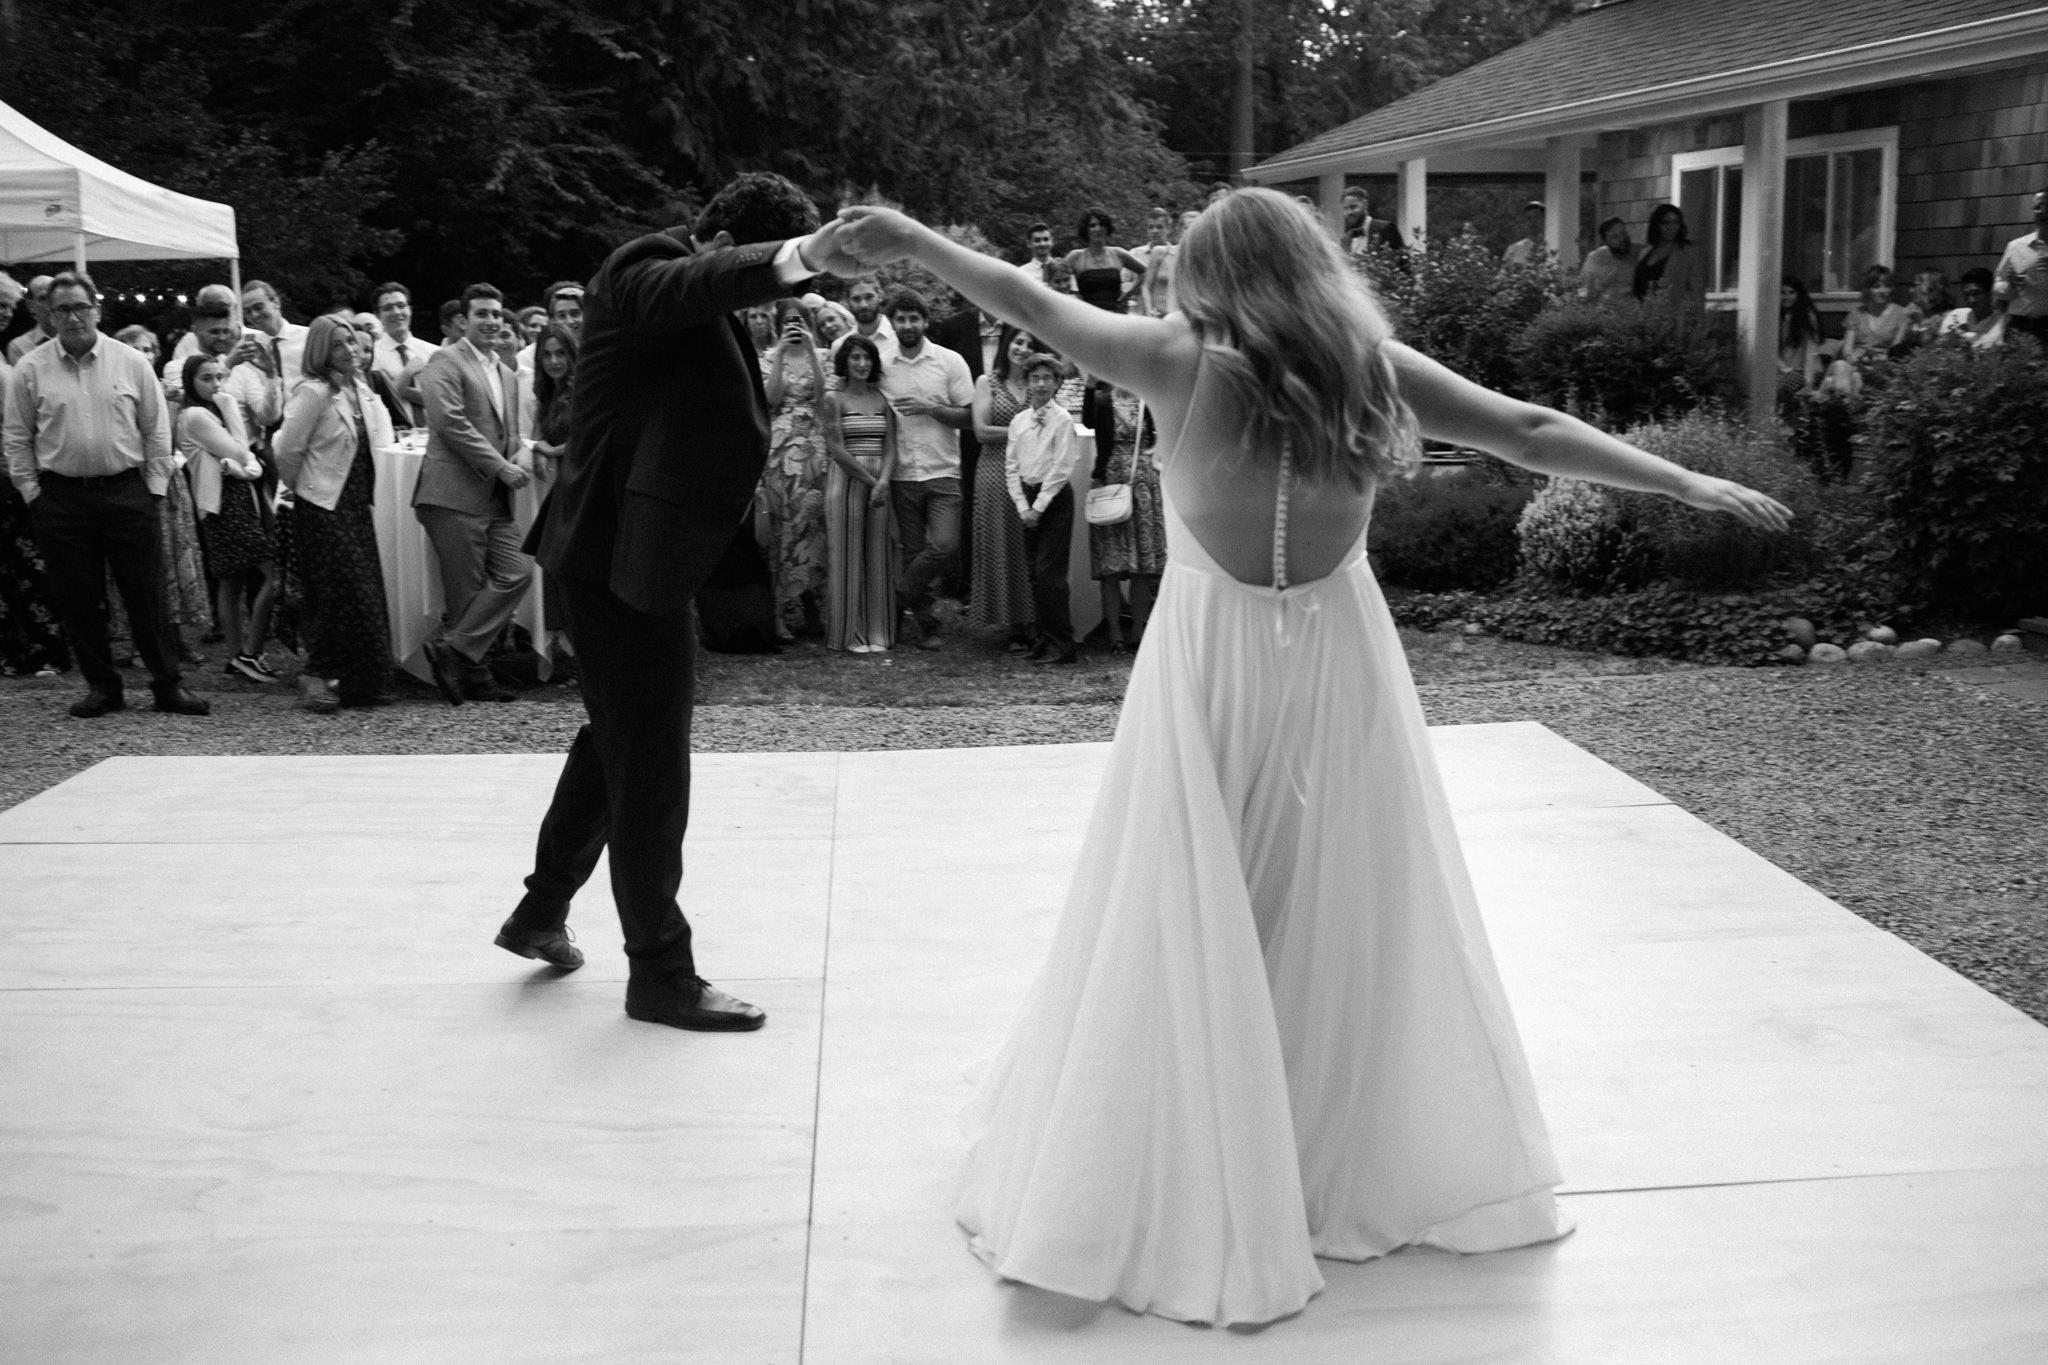 Backyard-Bainbridge-Island-Wedding-Alycia-Lovell-Photography-227.JPG